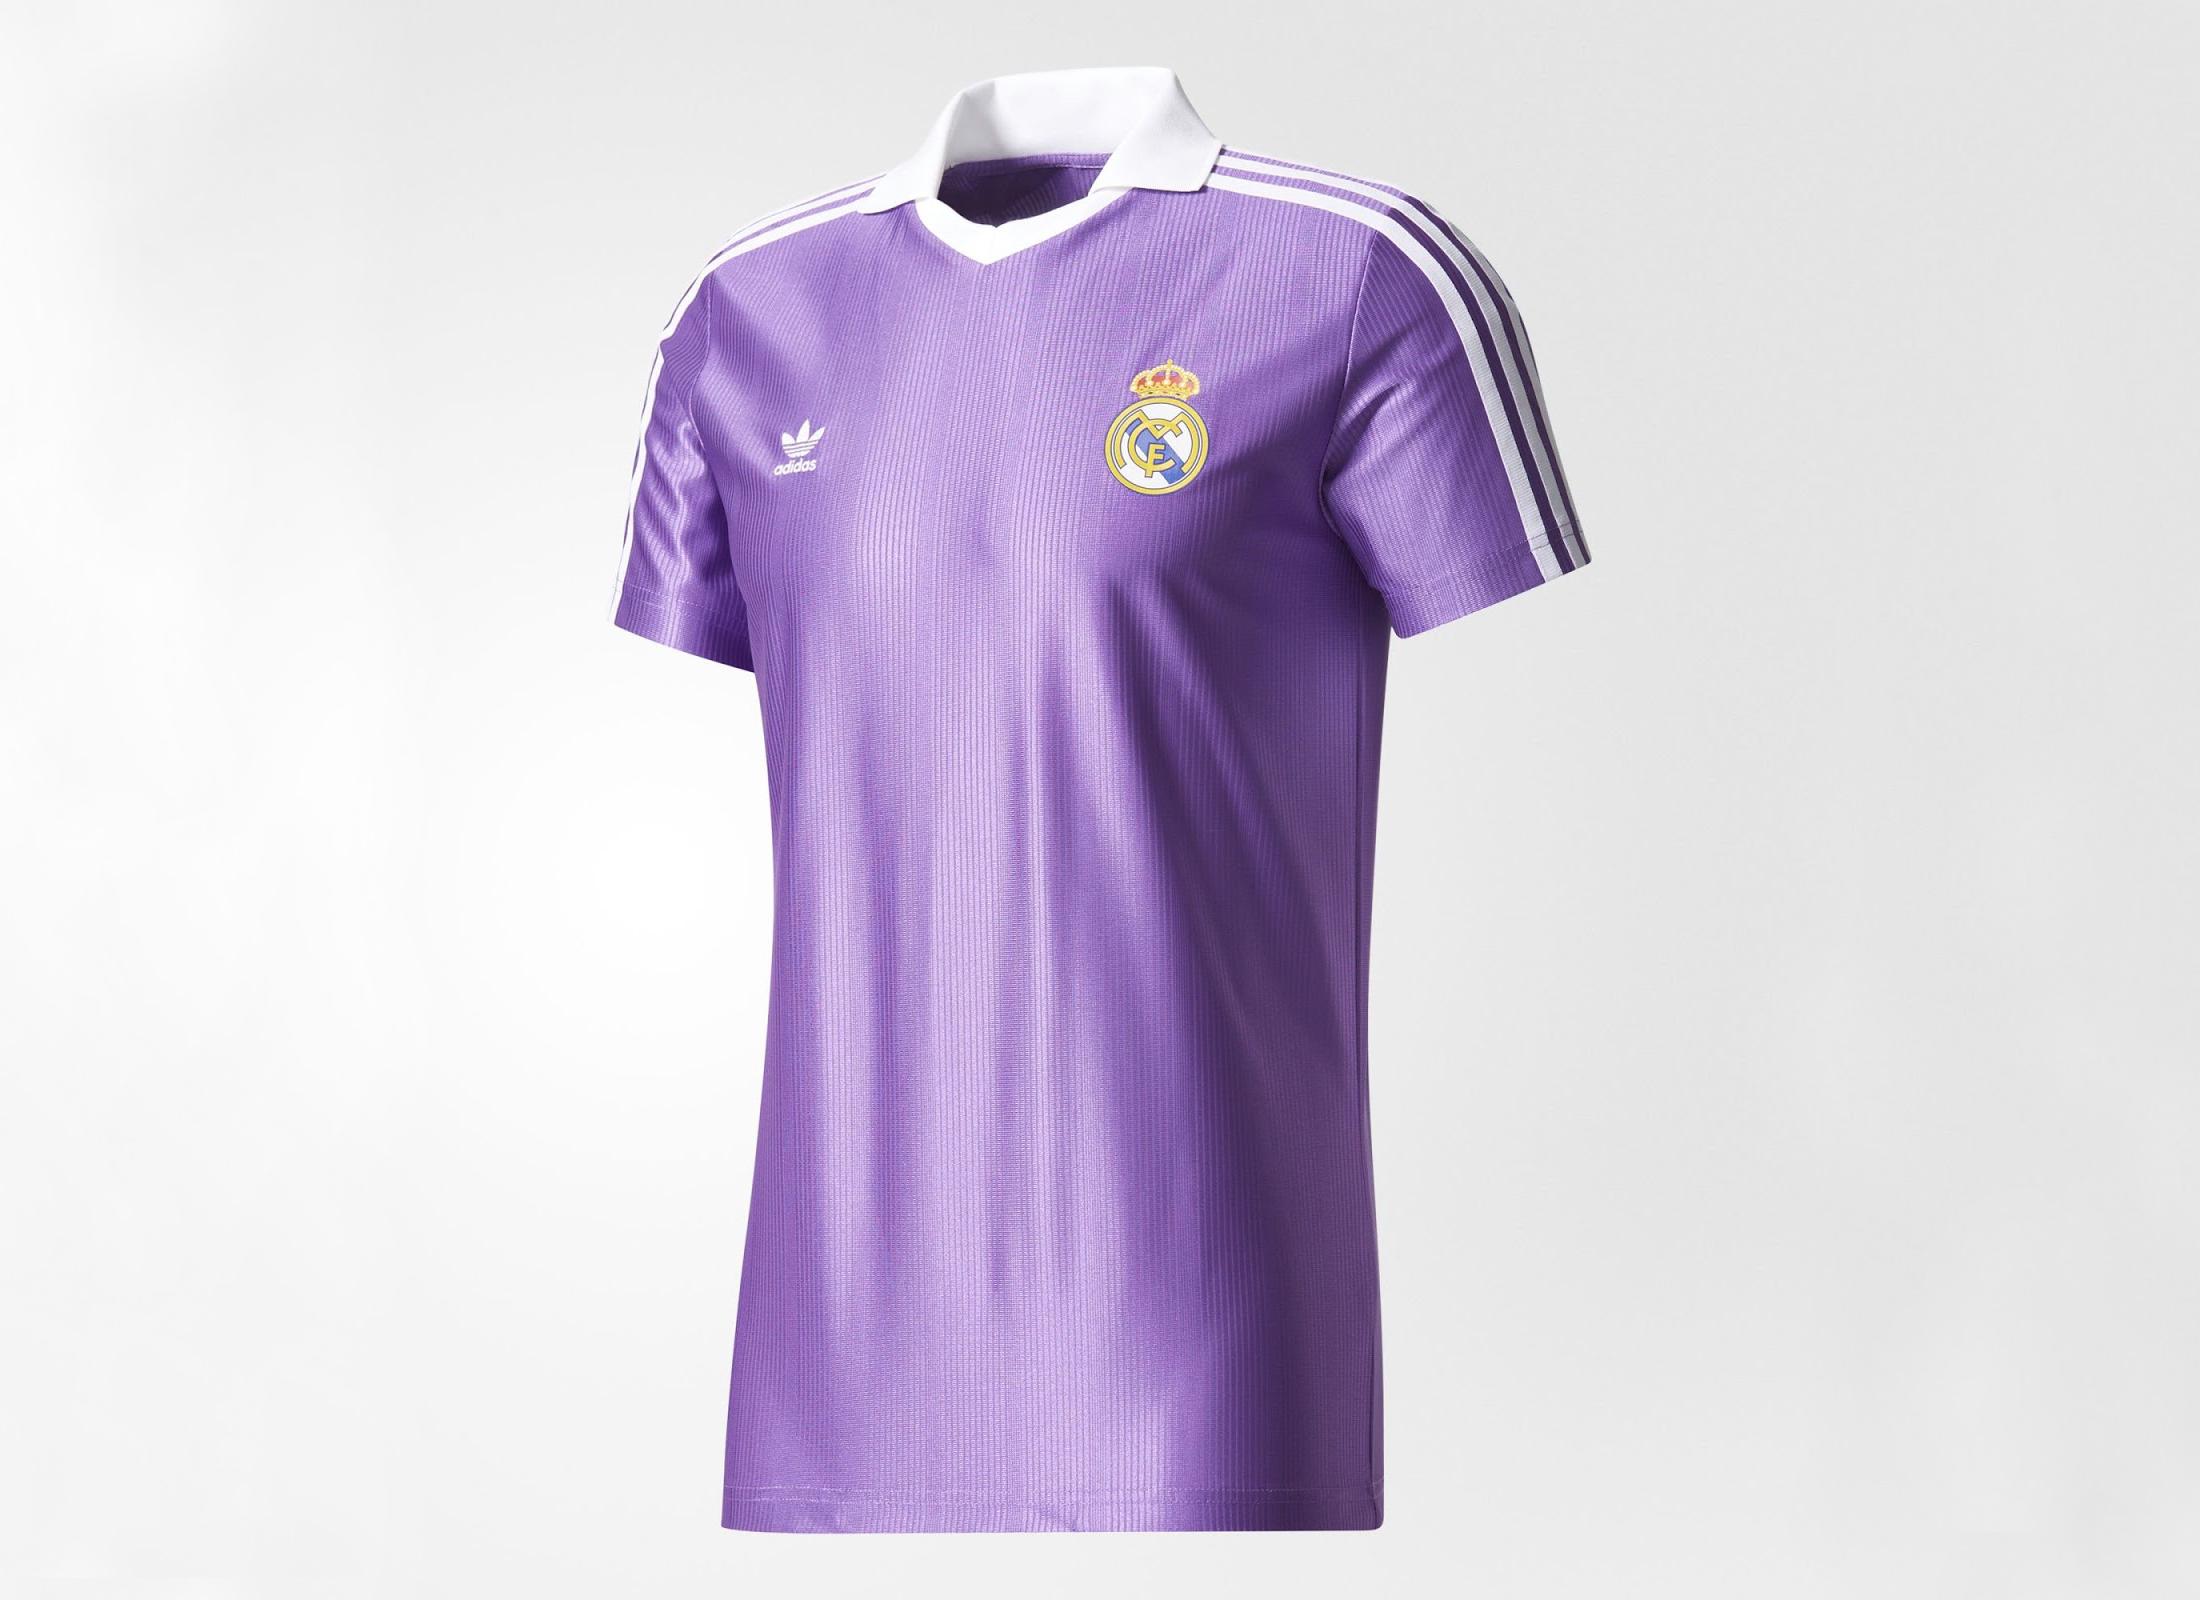 adidas-originals-real-madrid-2017-18-jersey (2)